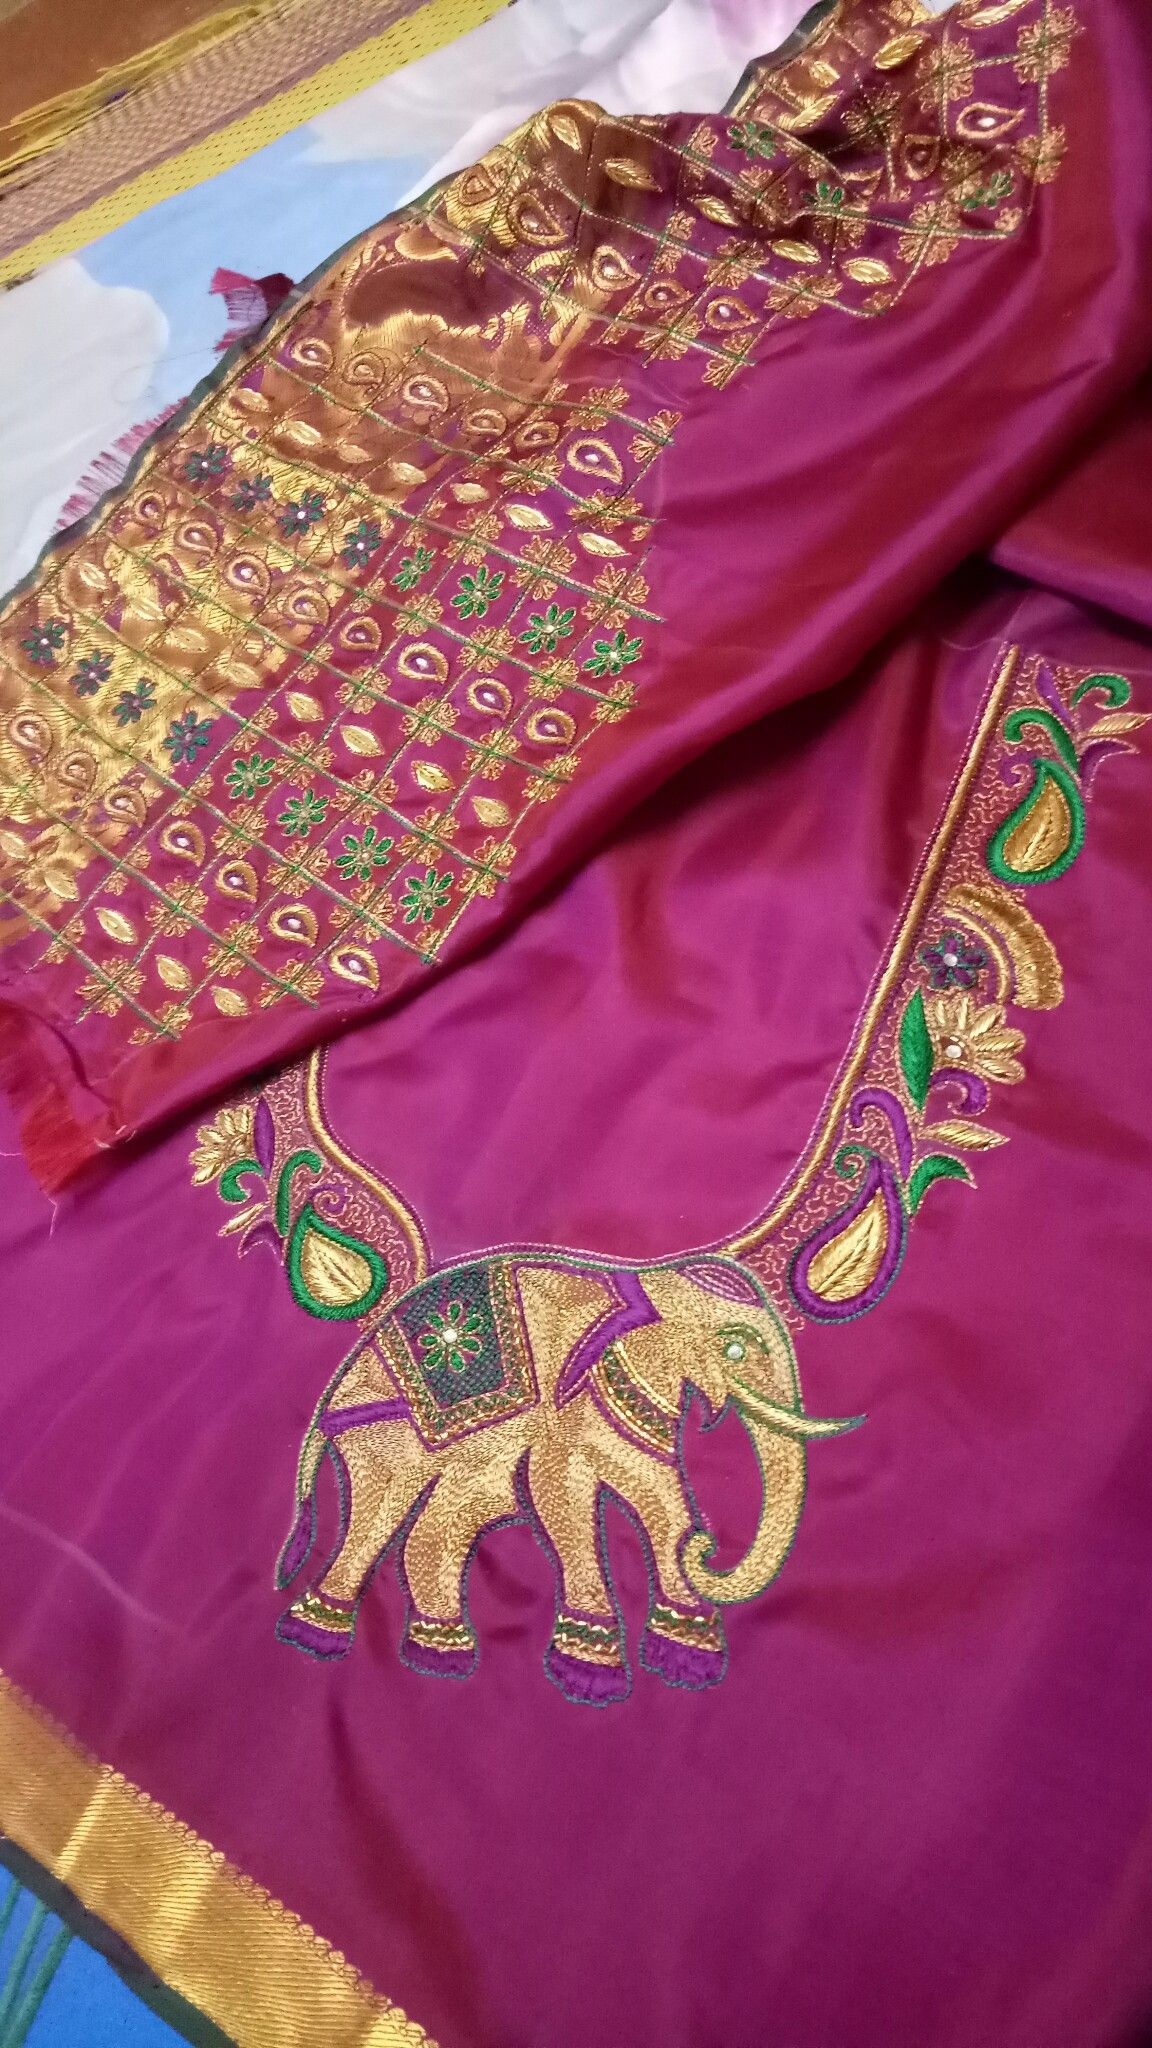 Pin by safikkarigargmel krigar on aman1 pinterest blouse blouse neck designs blouse patterns handloom saree indian blouse work blouse maggam works aari embroidery saree blouse elephant design bankloansurffo Images